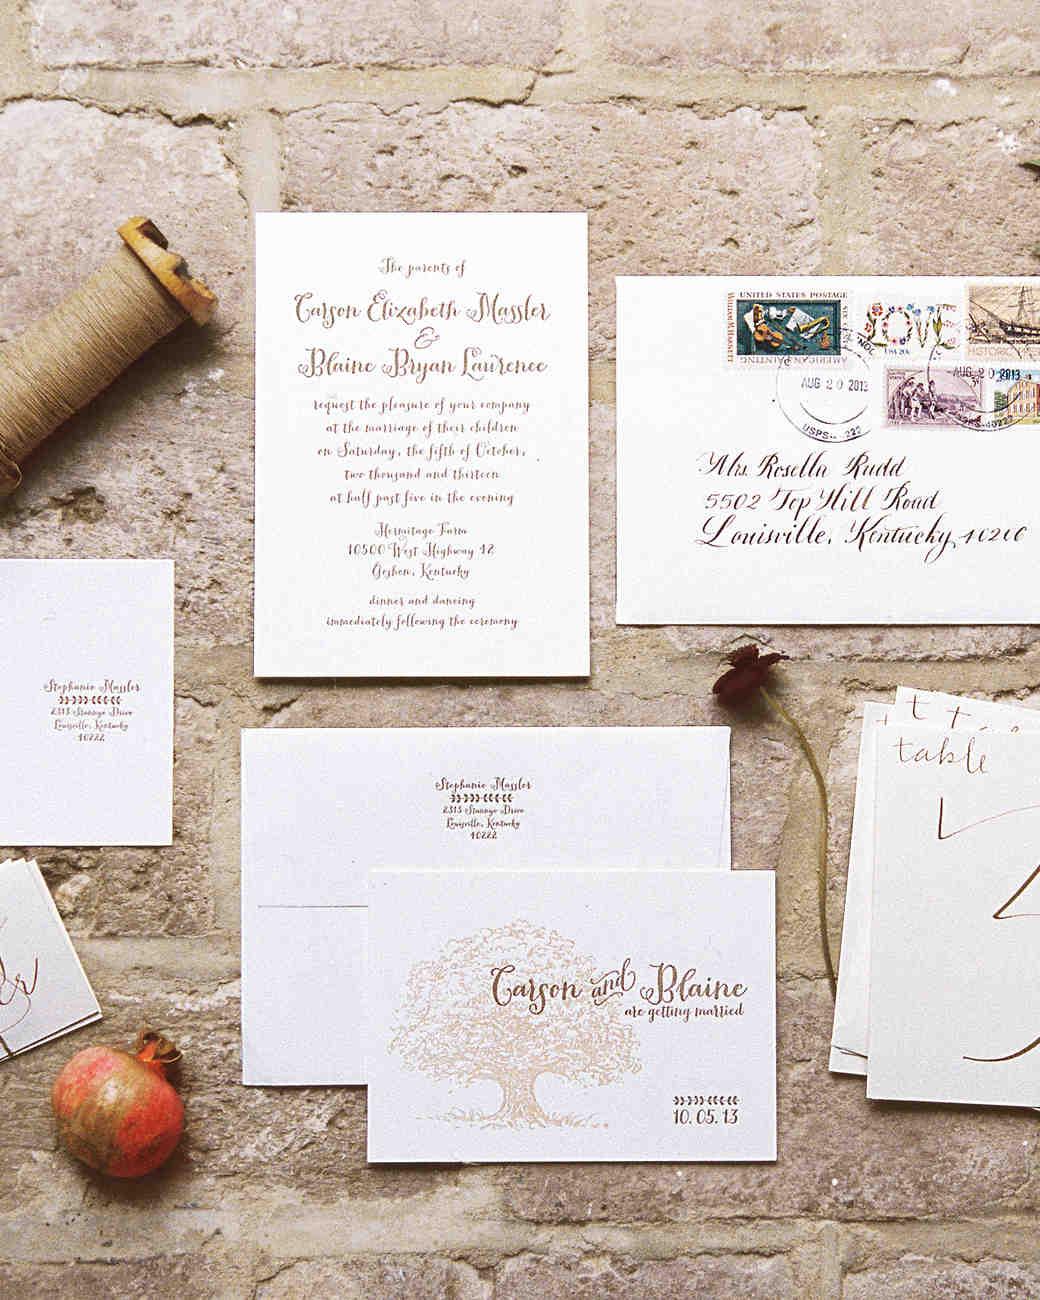 stationary-invitations-blaine-carson-wedding-008-mwds110873.jpg